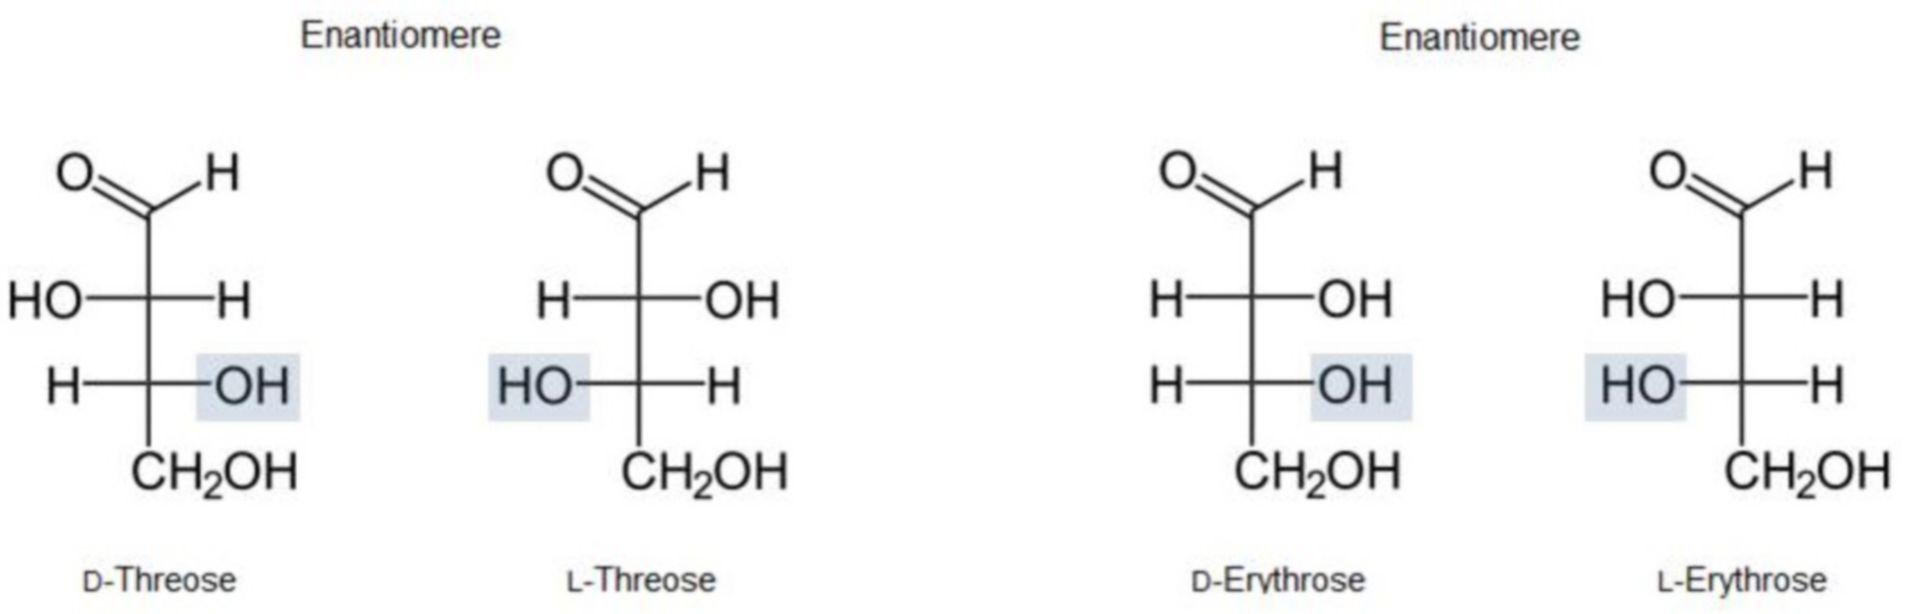 Enatiomere Aldotetrosen